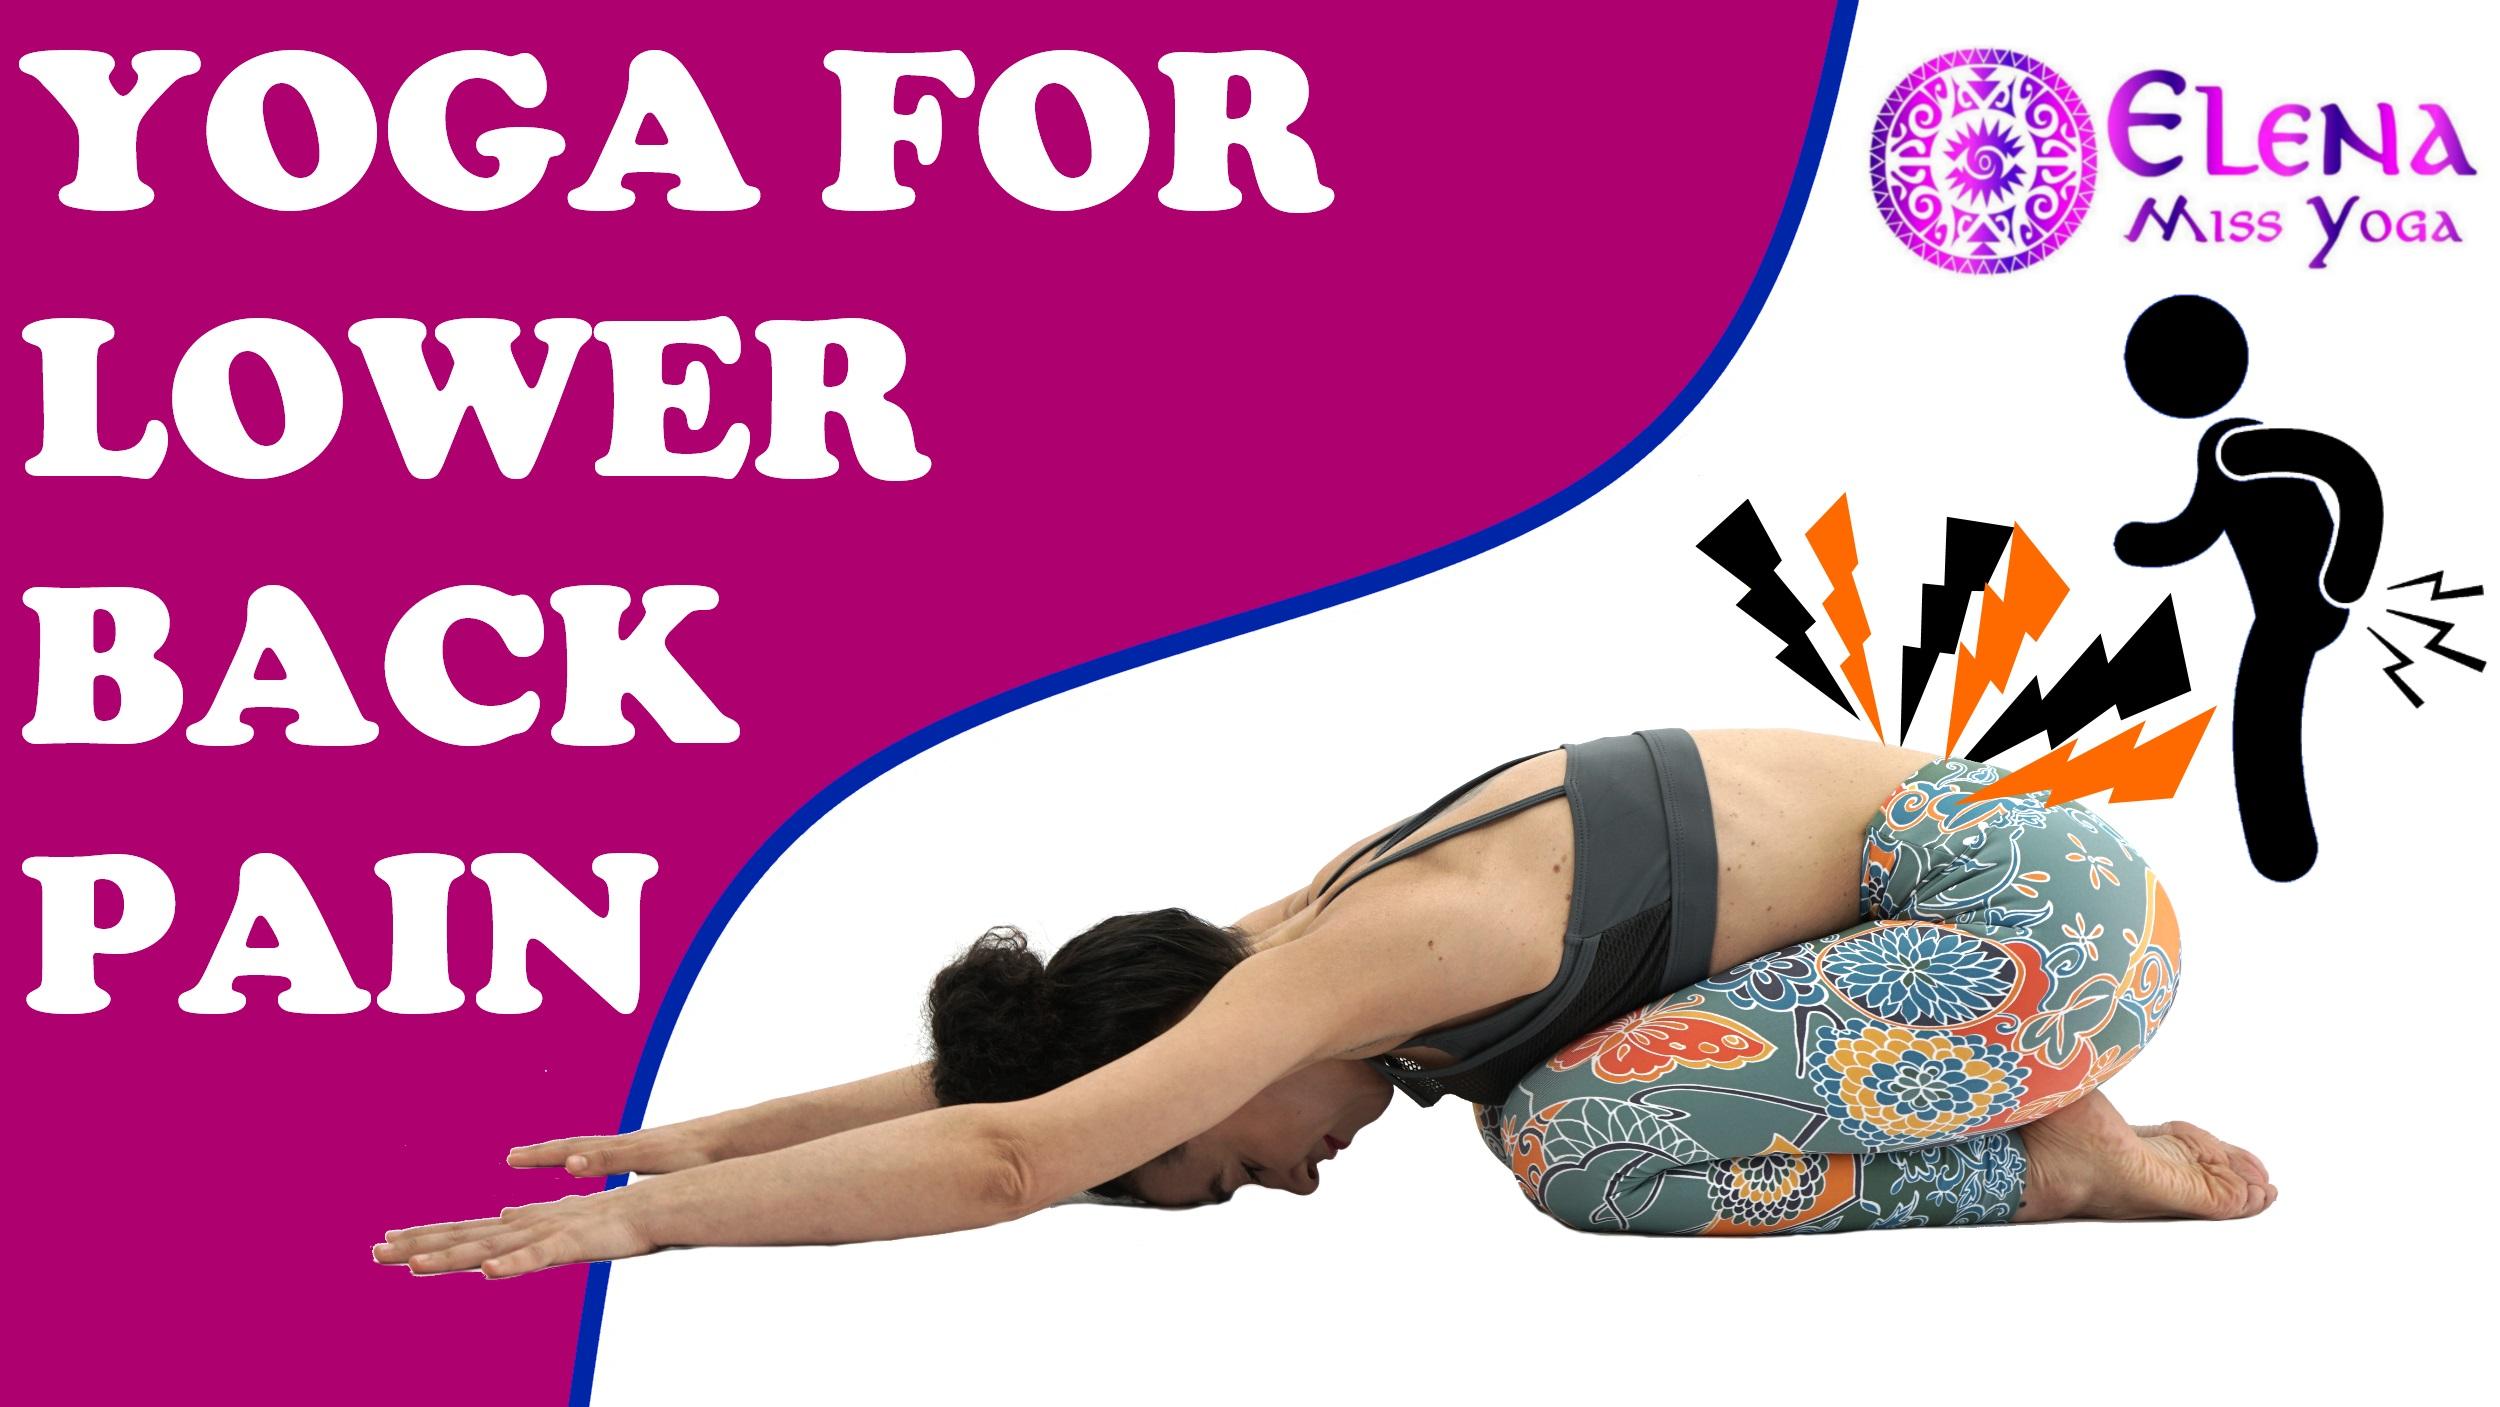 YOGA FOR BACK PAIN - YOGA CLASS